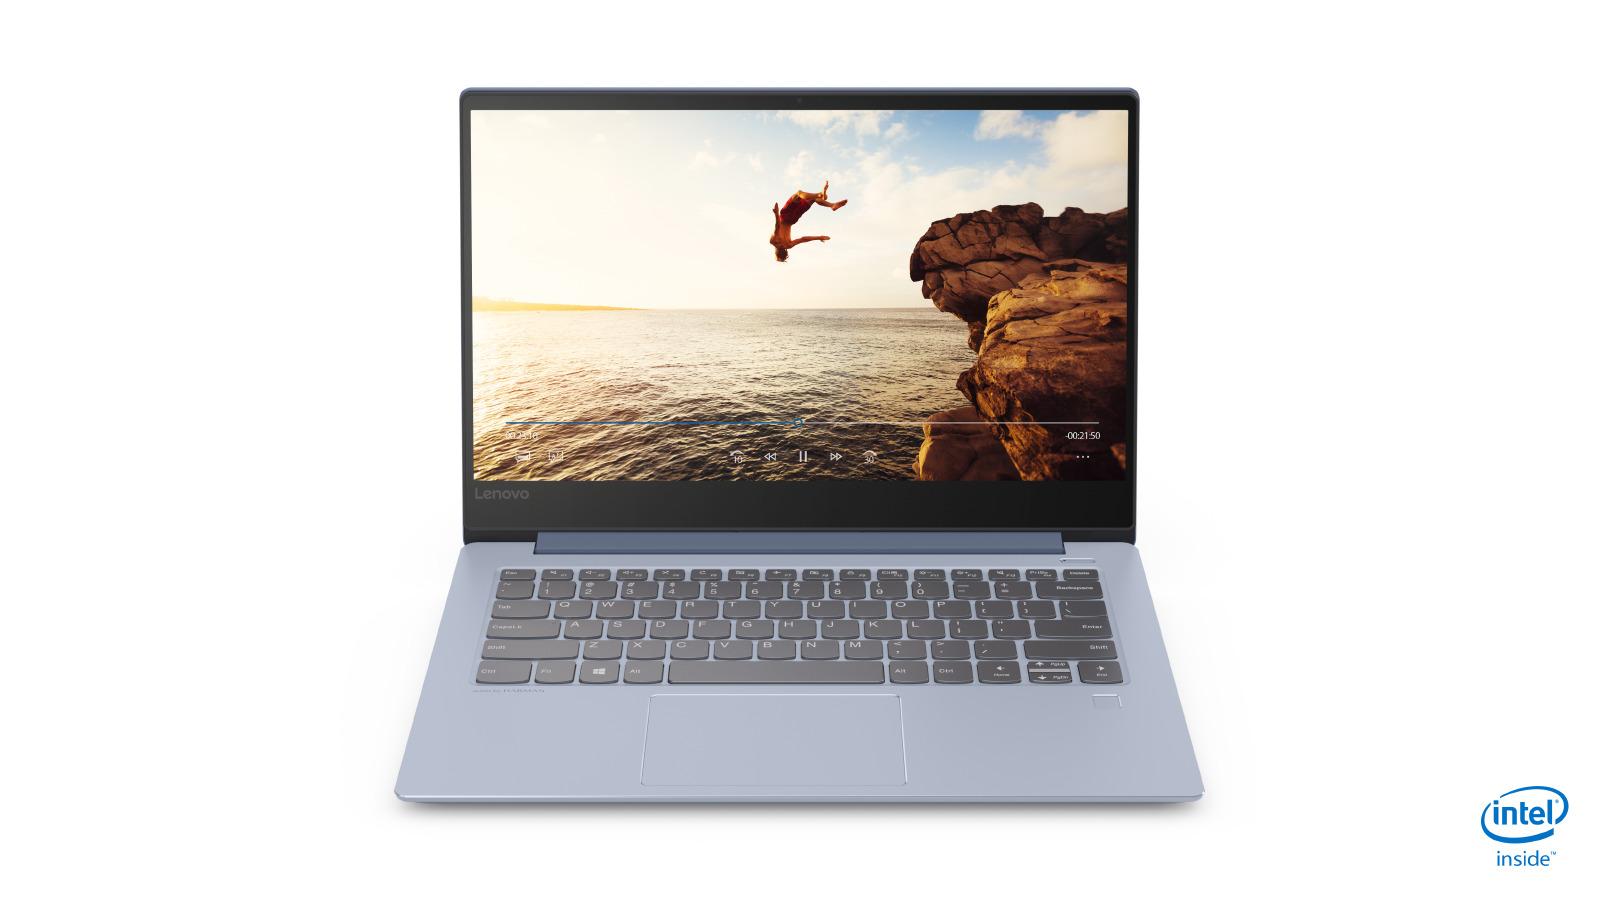 "Lenovo IdeaPad 530S-14ARR AMD Ryzen 5 2500U 3,60GHz/8GB/SSD 512GB/14"" FHD/IPS/AG/WIN10 modrá 81H10010CK"